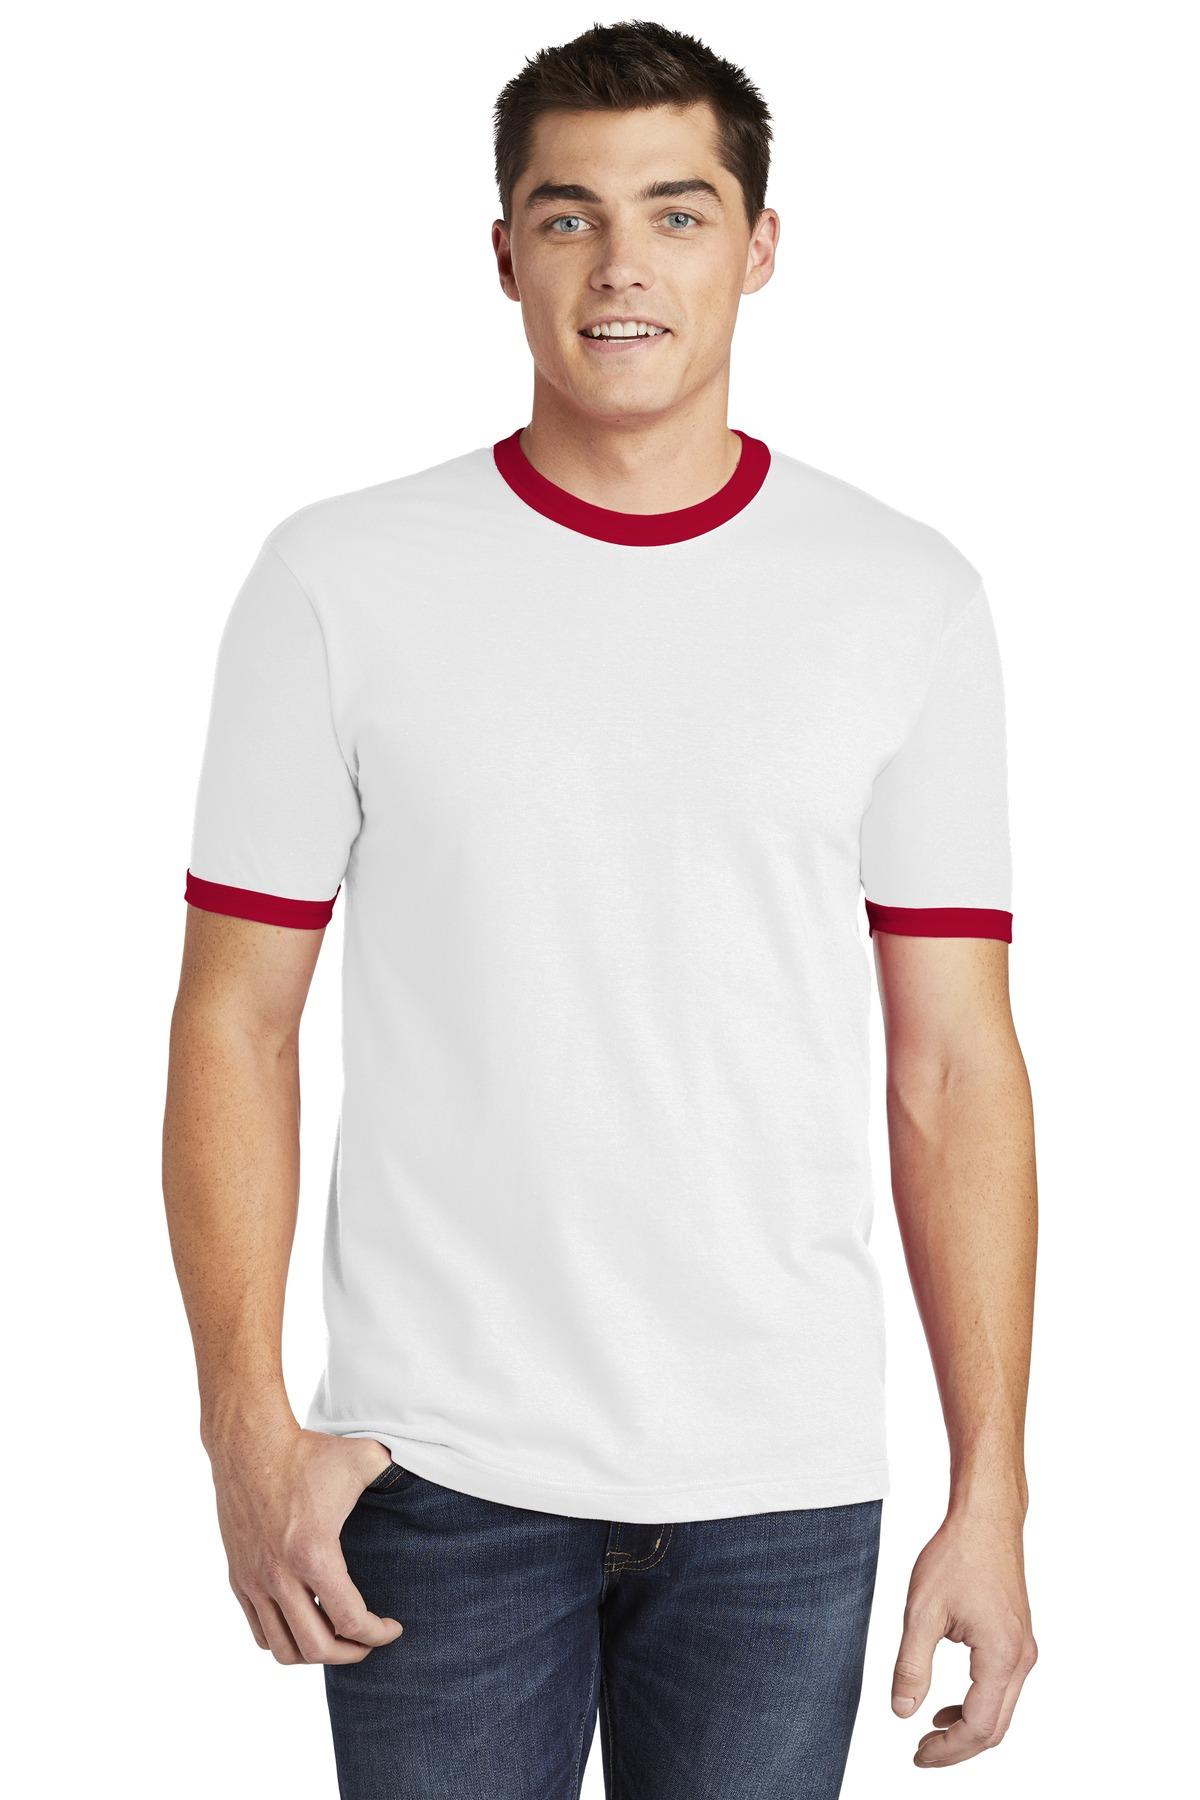 70e8e41f Buy American Apparel ® Fine Jersey Ringer T-Shirt. - Anvil Online at ...